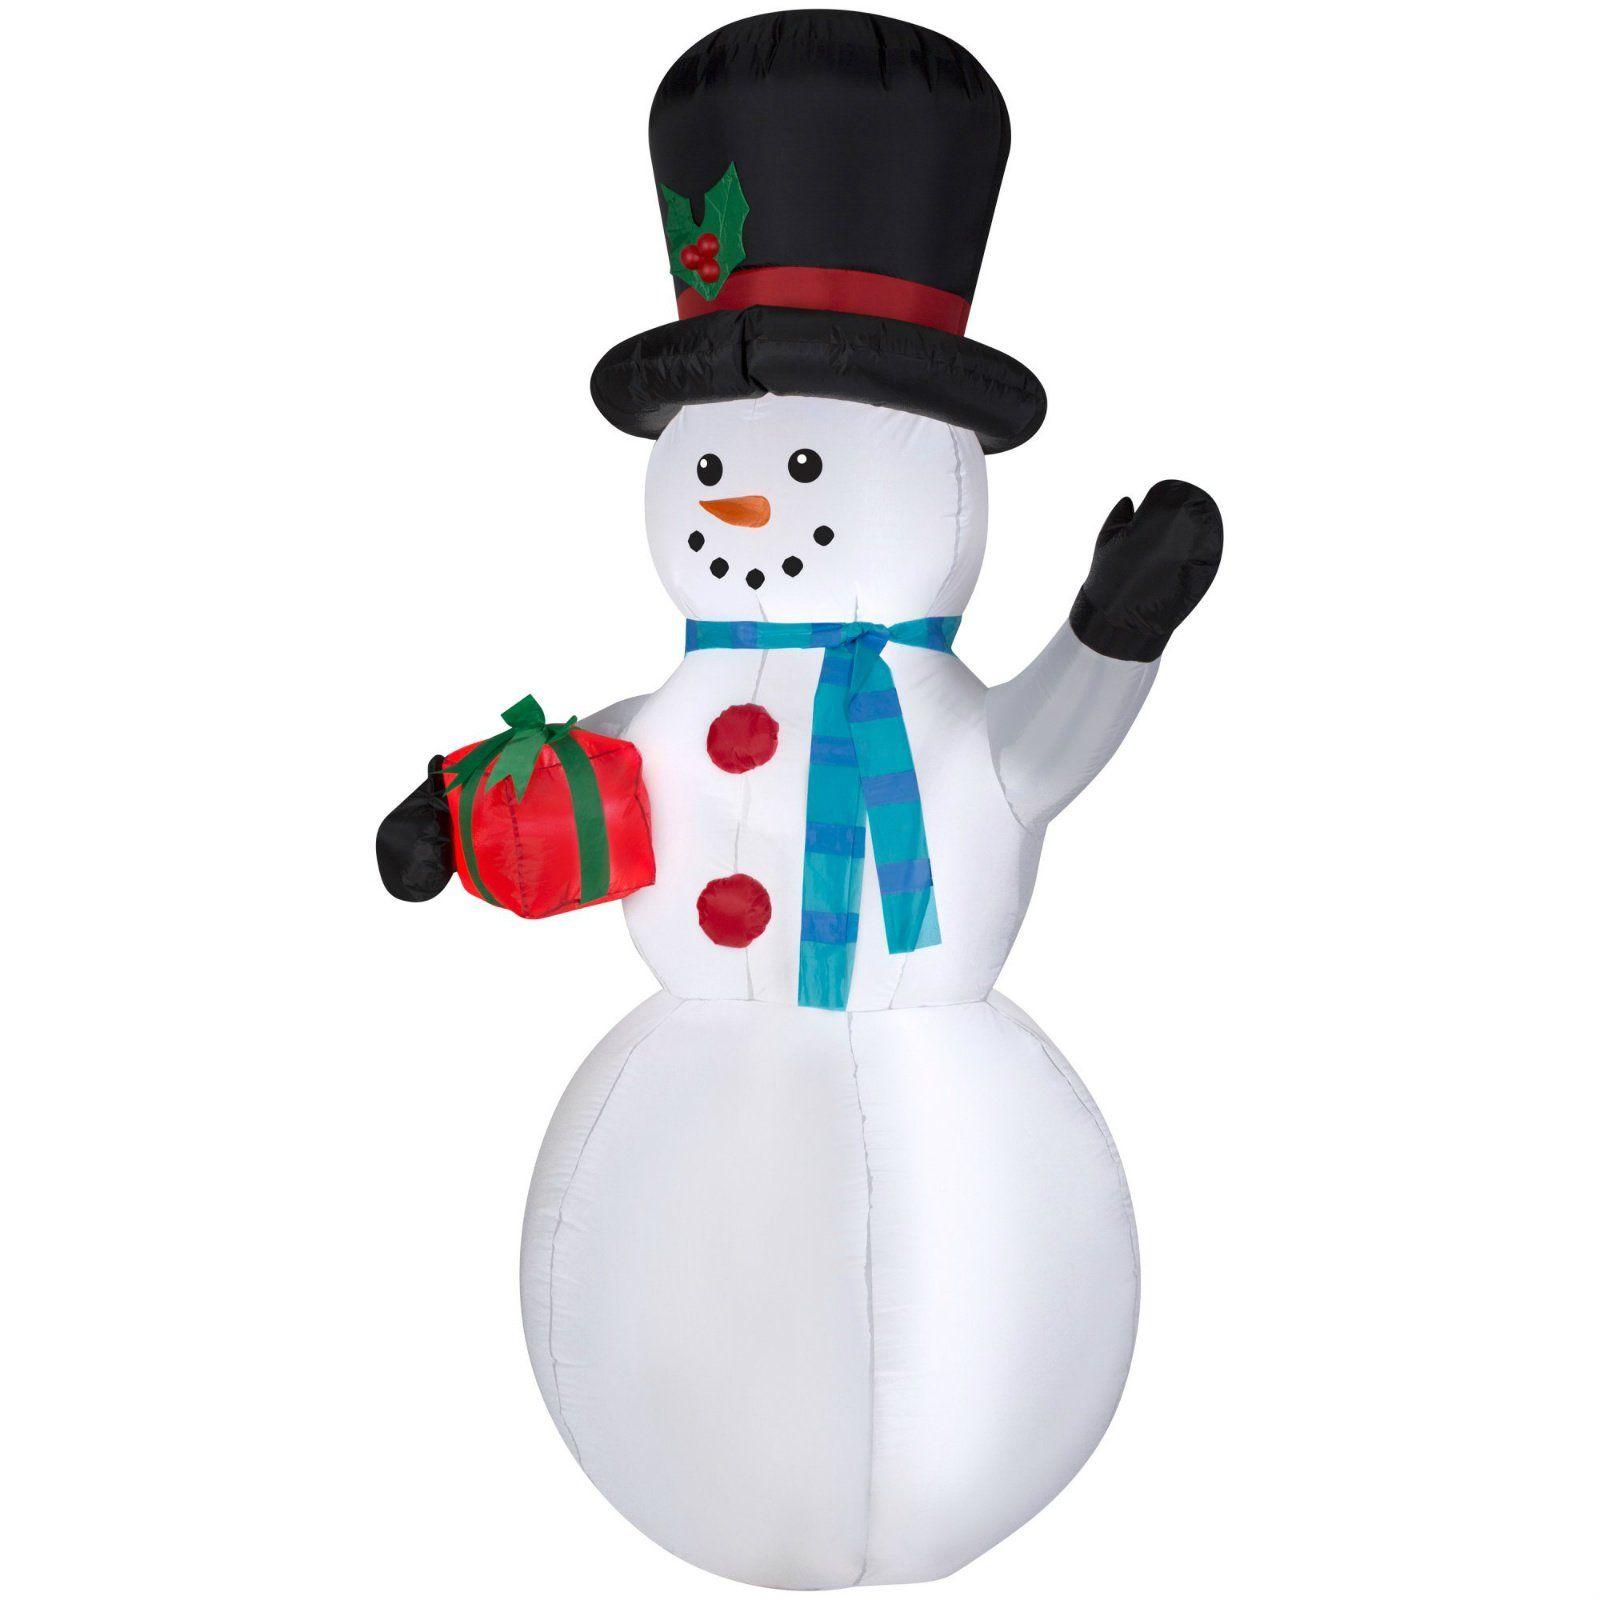 christmas giant inflatable snowman 7ft tall